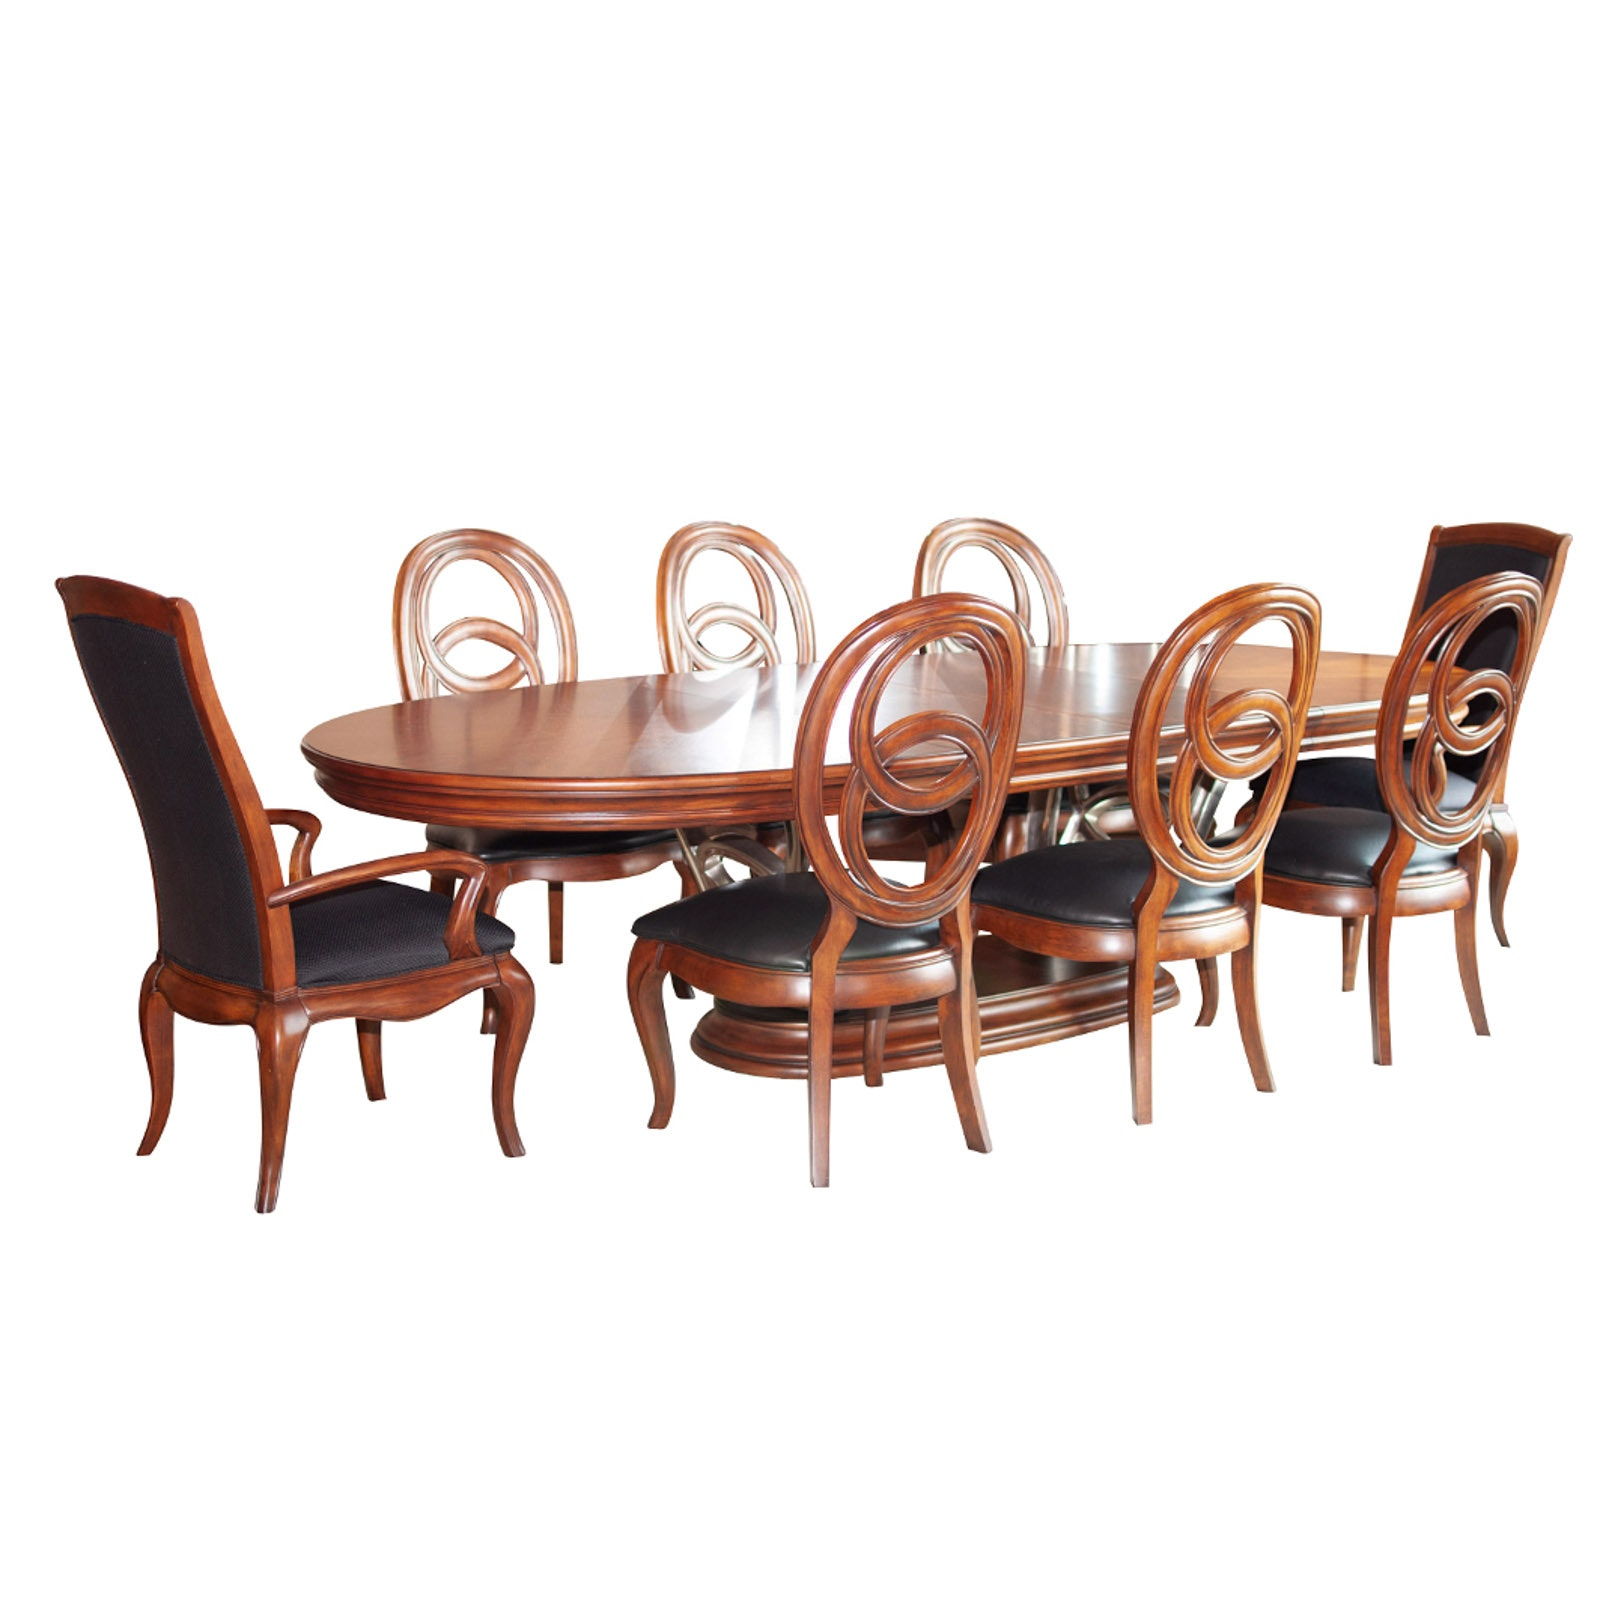 Contemporary Mahogany Finish Dining Room Set by American Drew